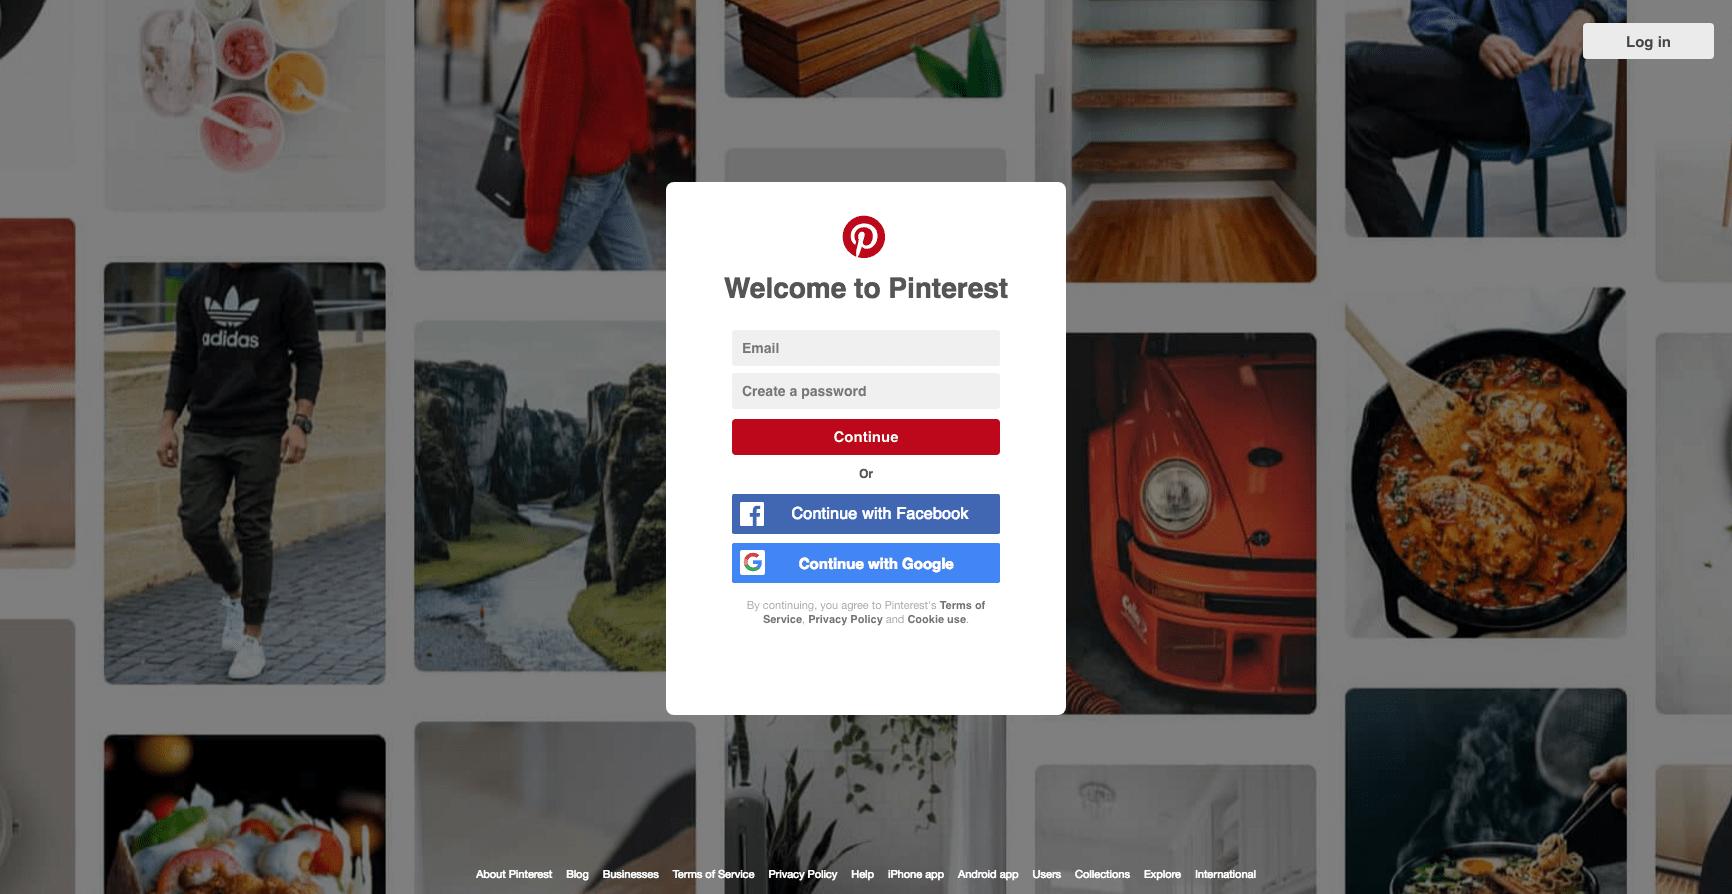 Landing page design: Pinterest